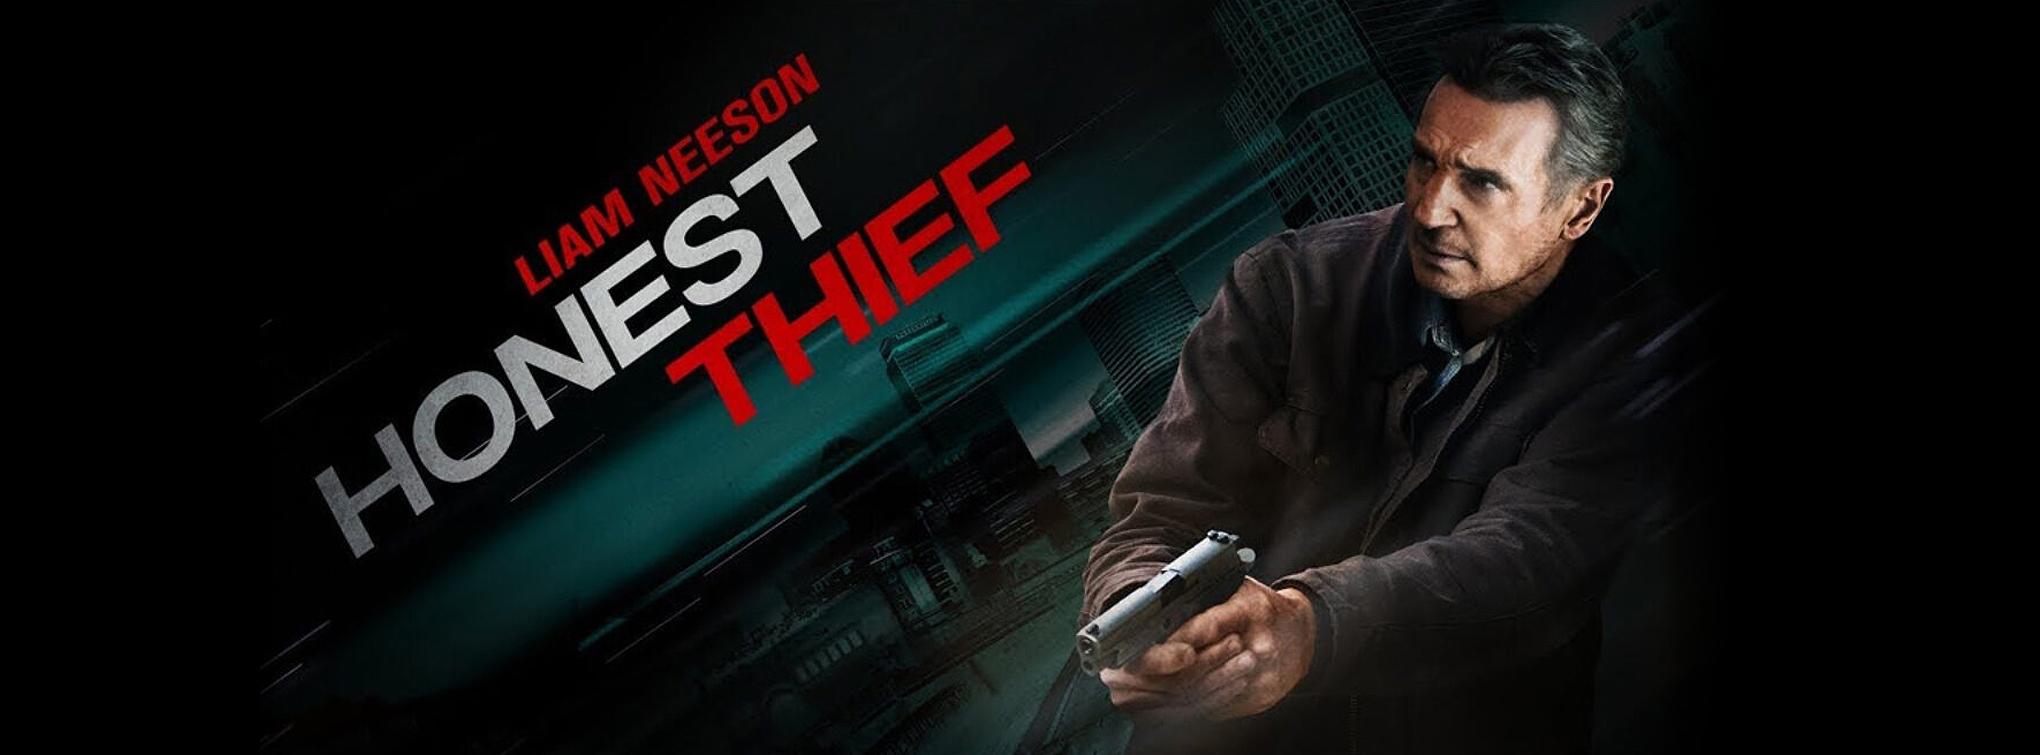 Slider image for Honest Thief